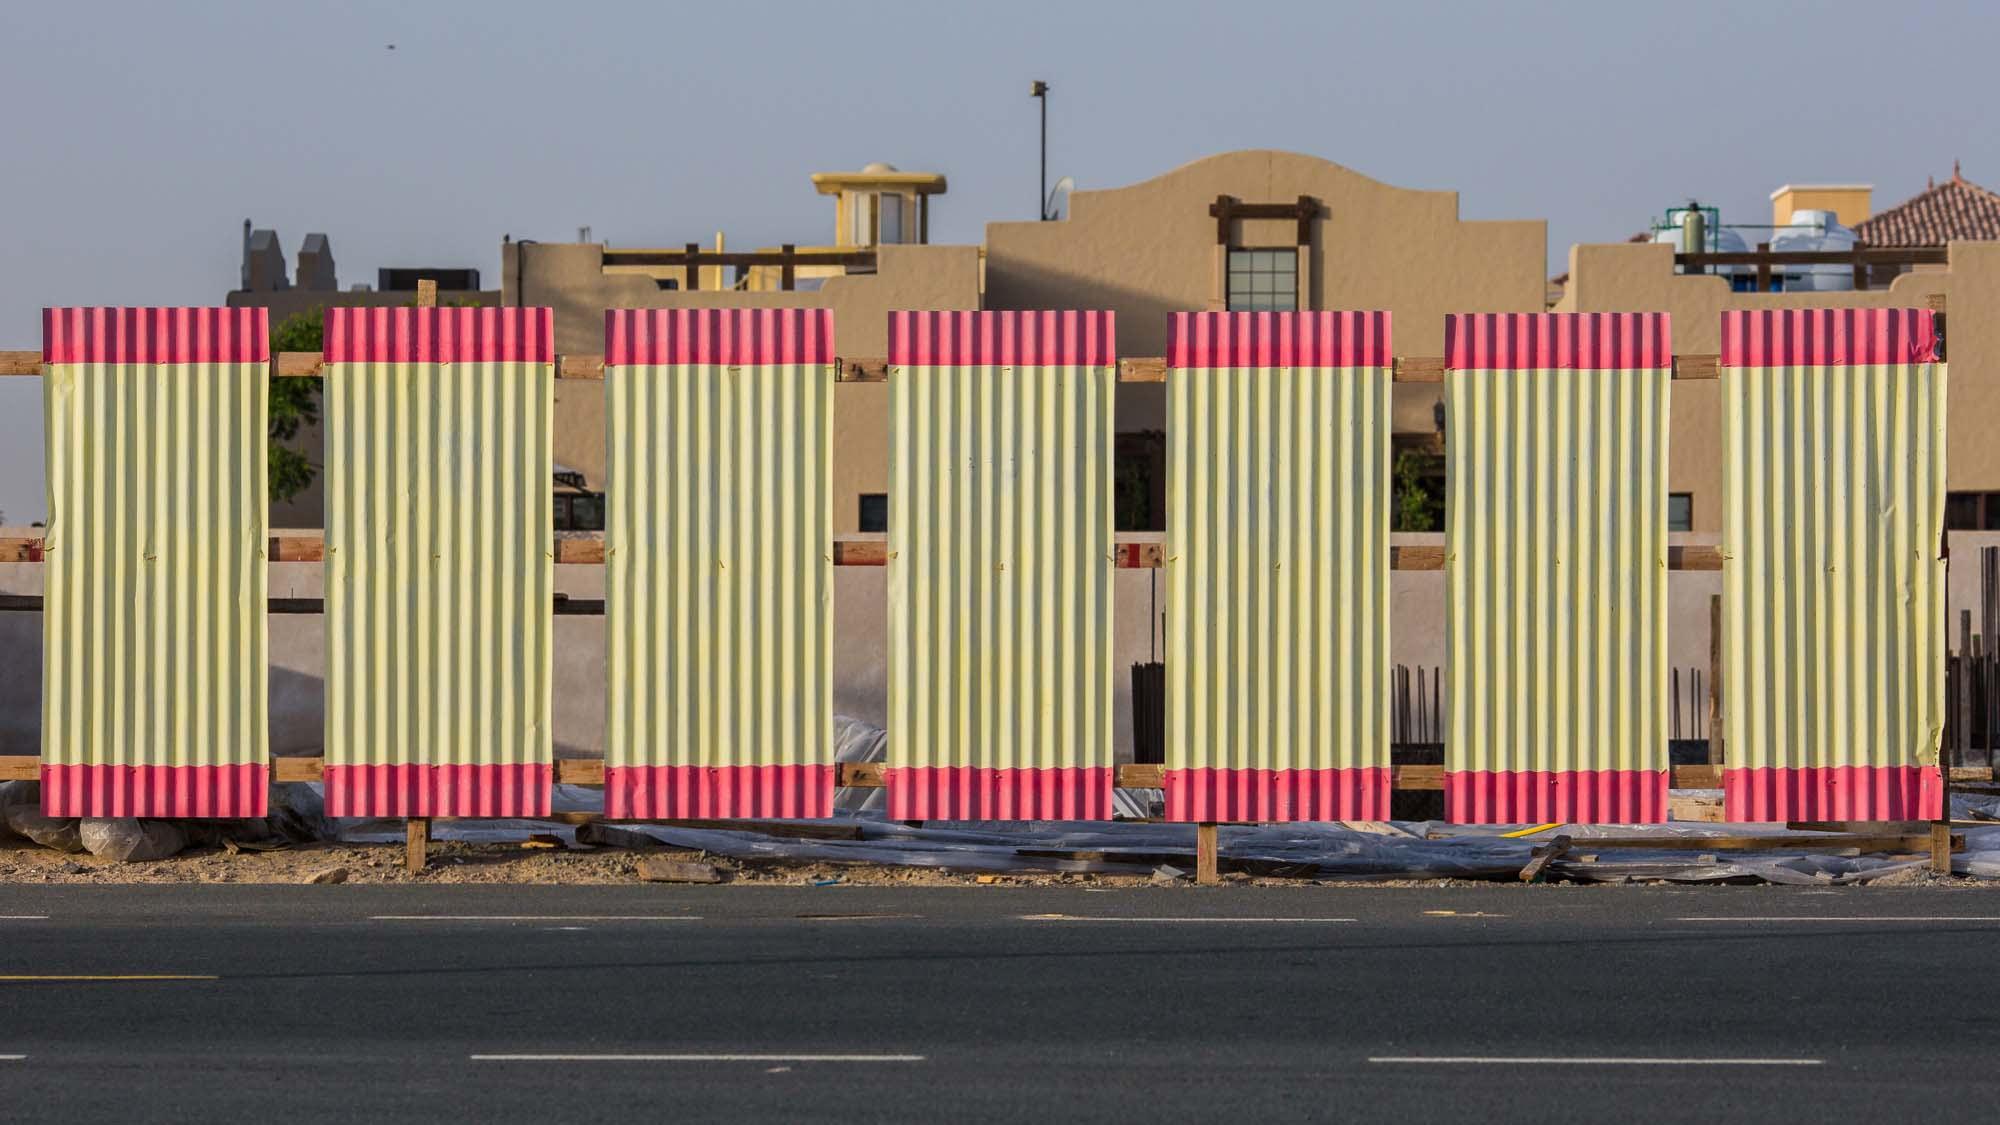 Hussain AlMoosawi – Under Construction